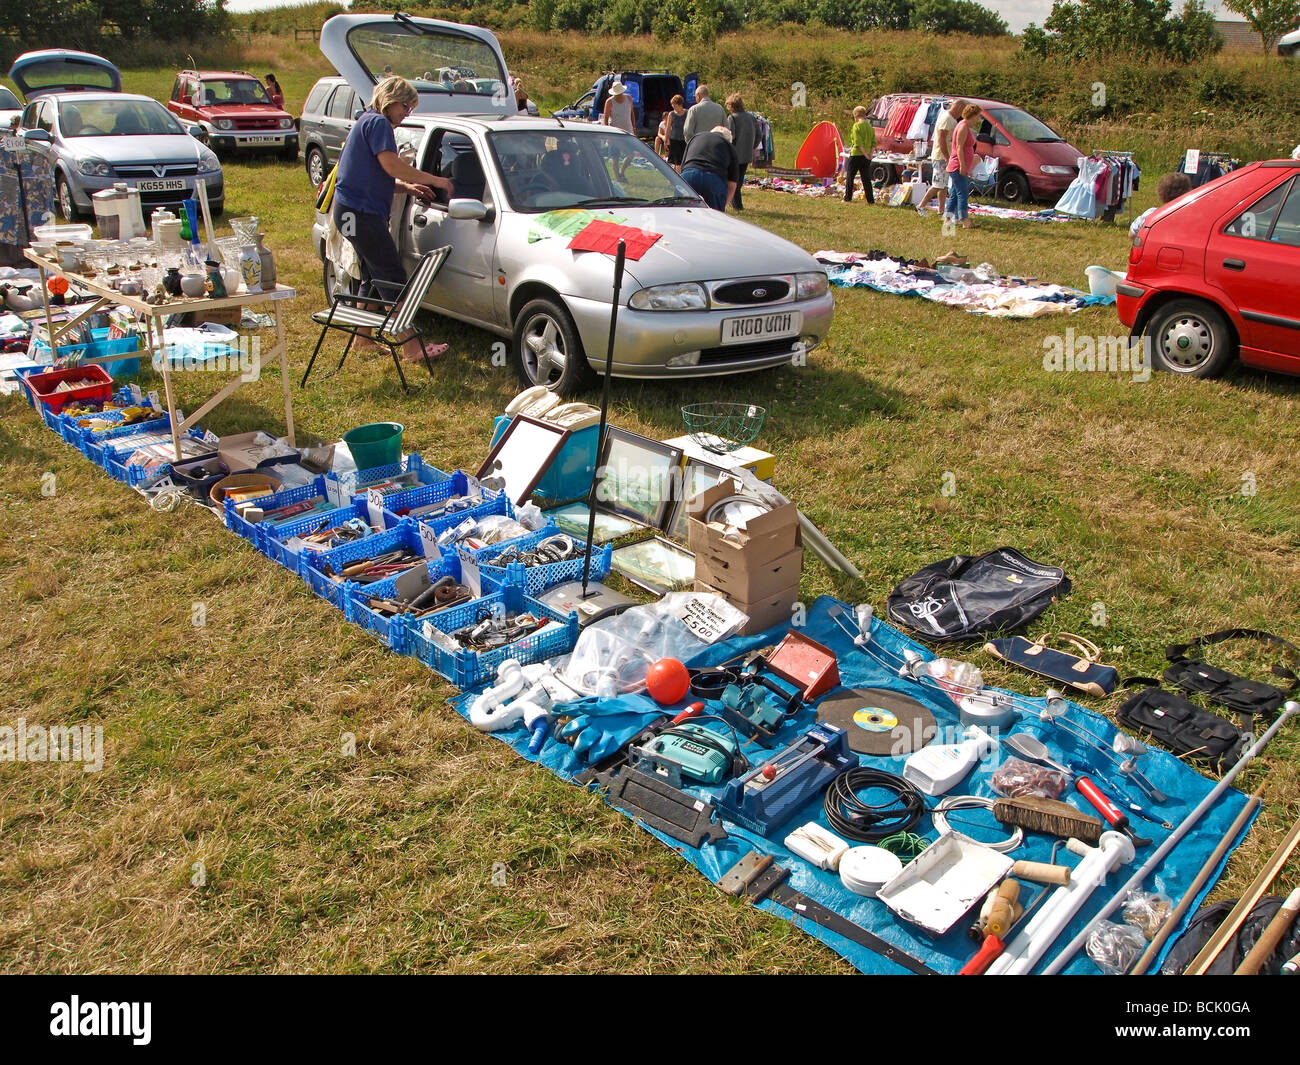 Car boot sale Yorkshire UK - Stock Image